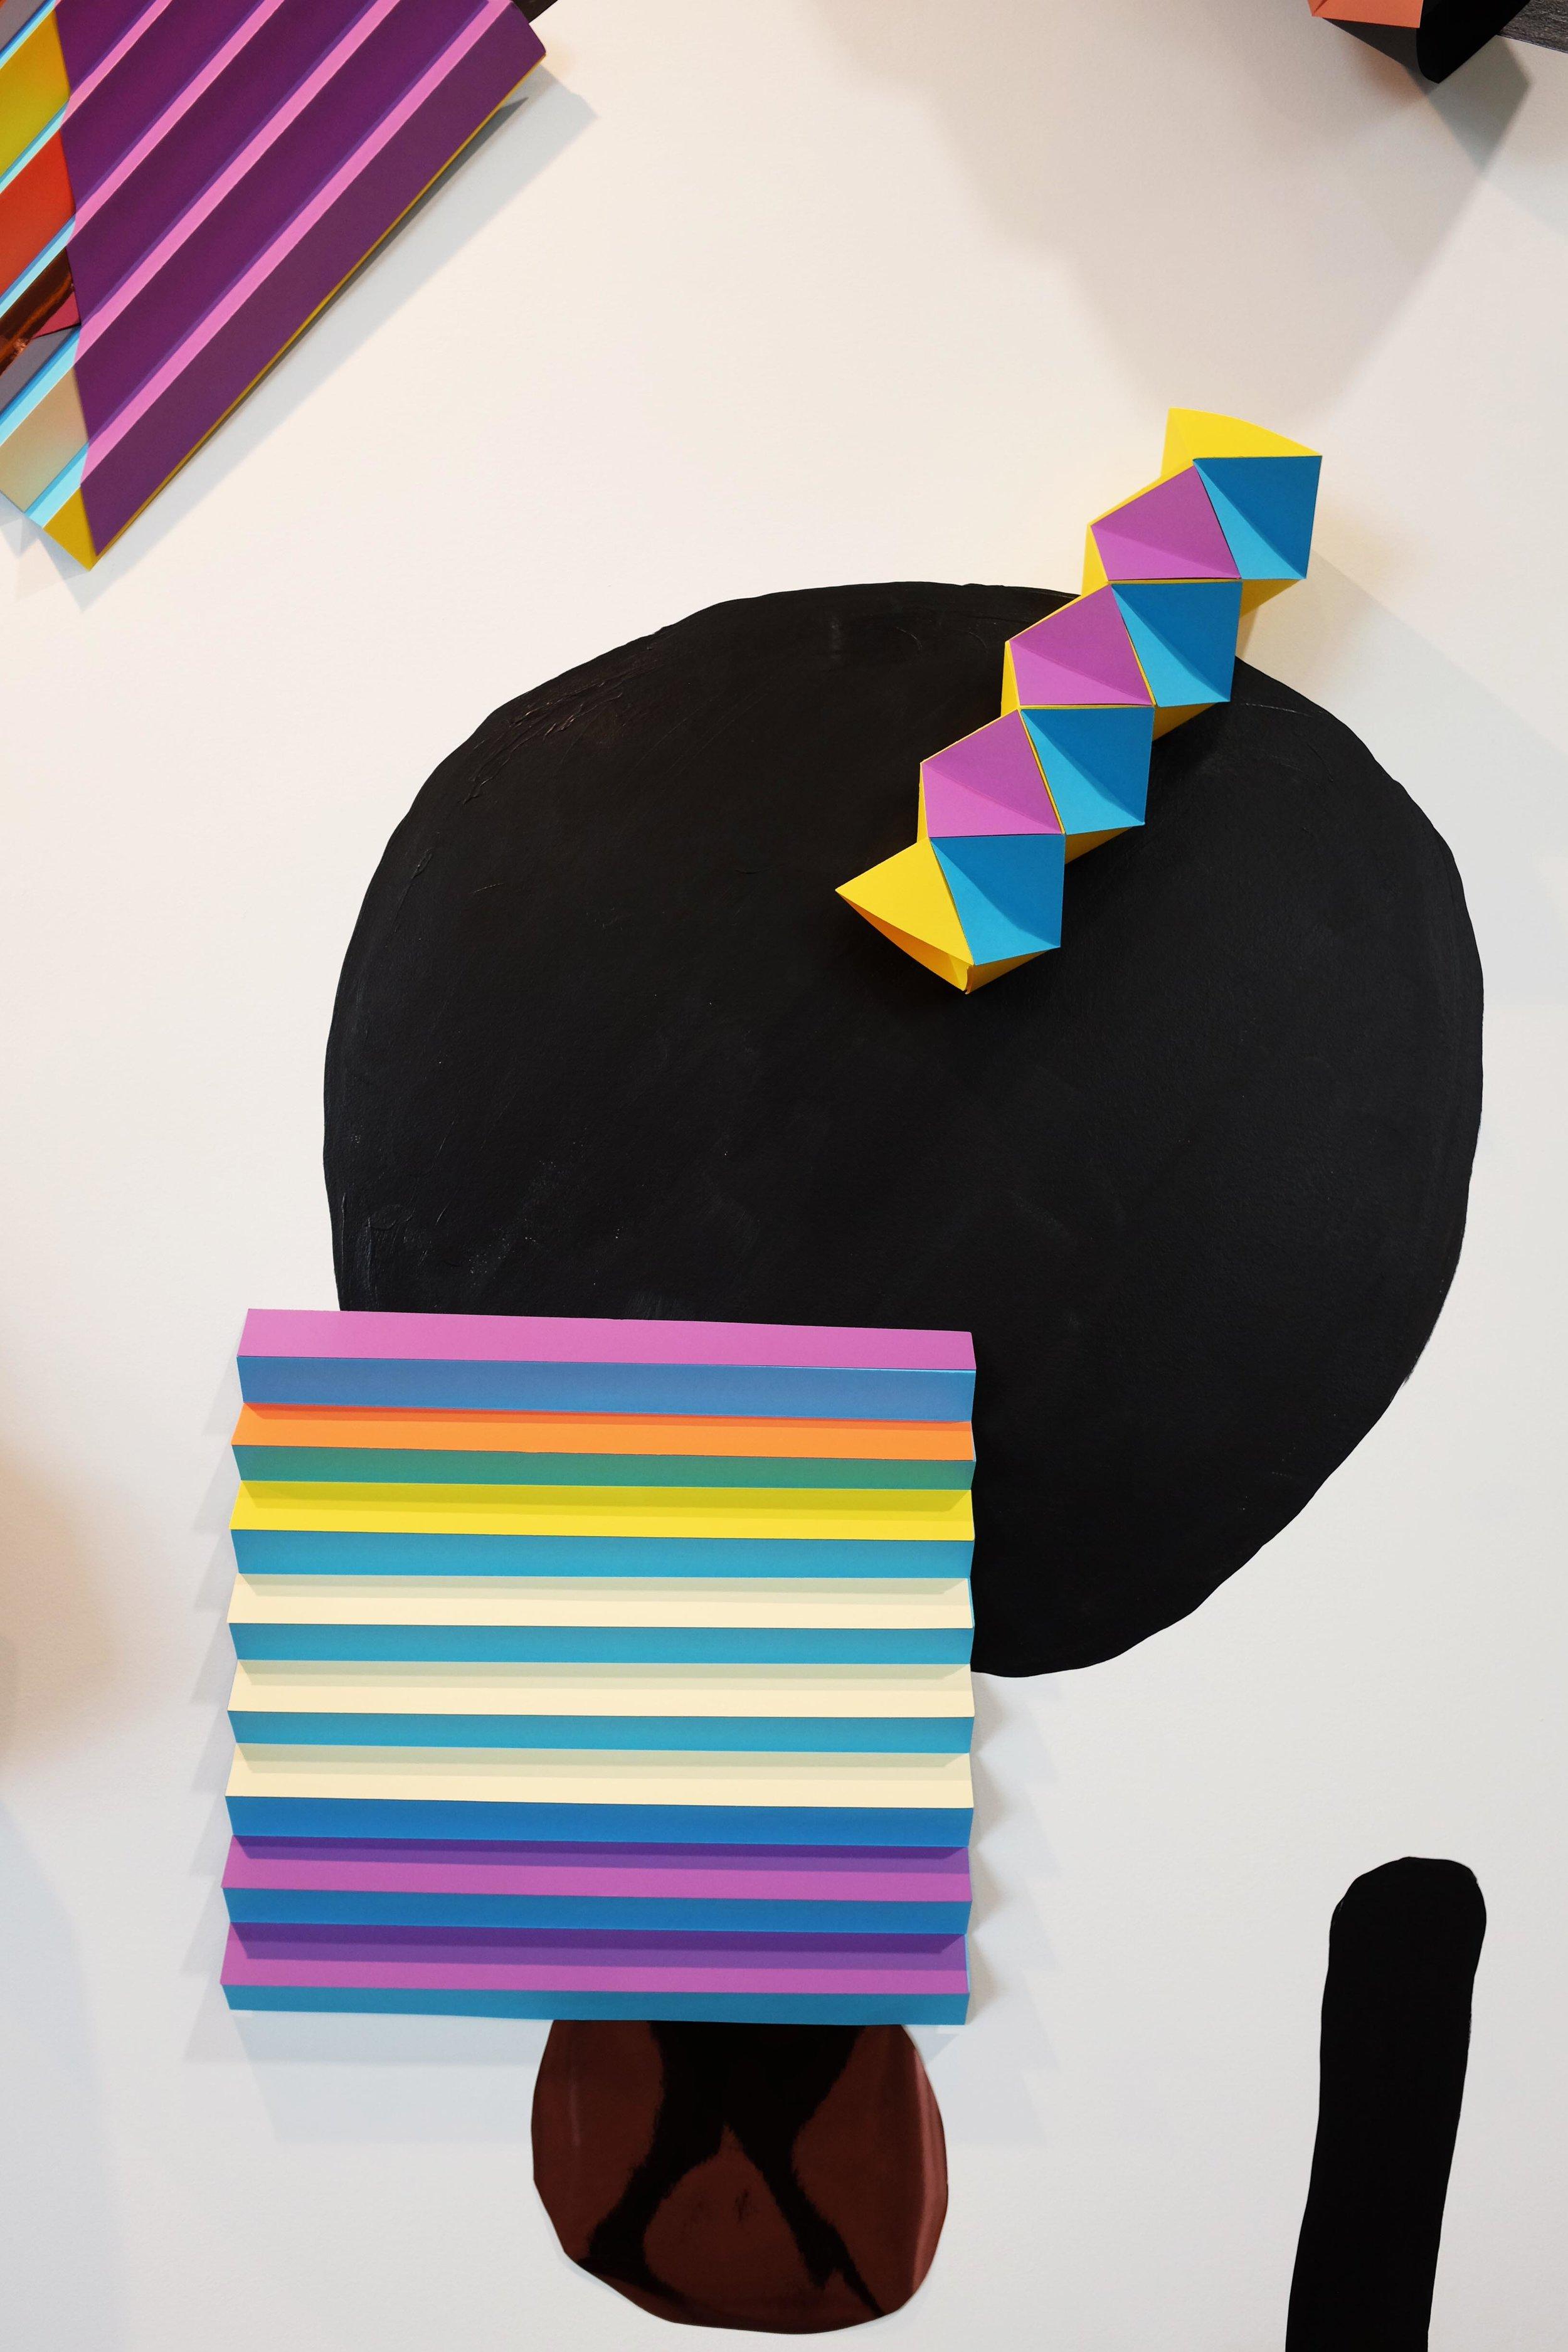 miss-cloudy-pauline-loctin-artist-project-2019-paper-art-origami-entrance-toronto-8.jpg